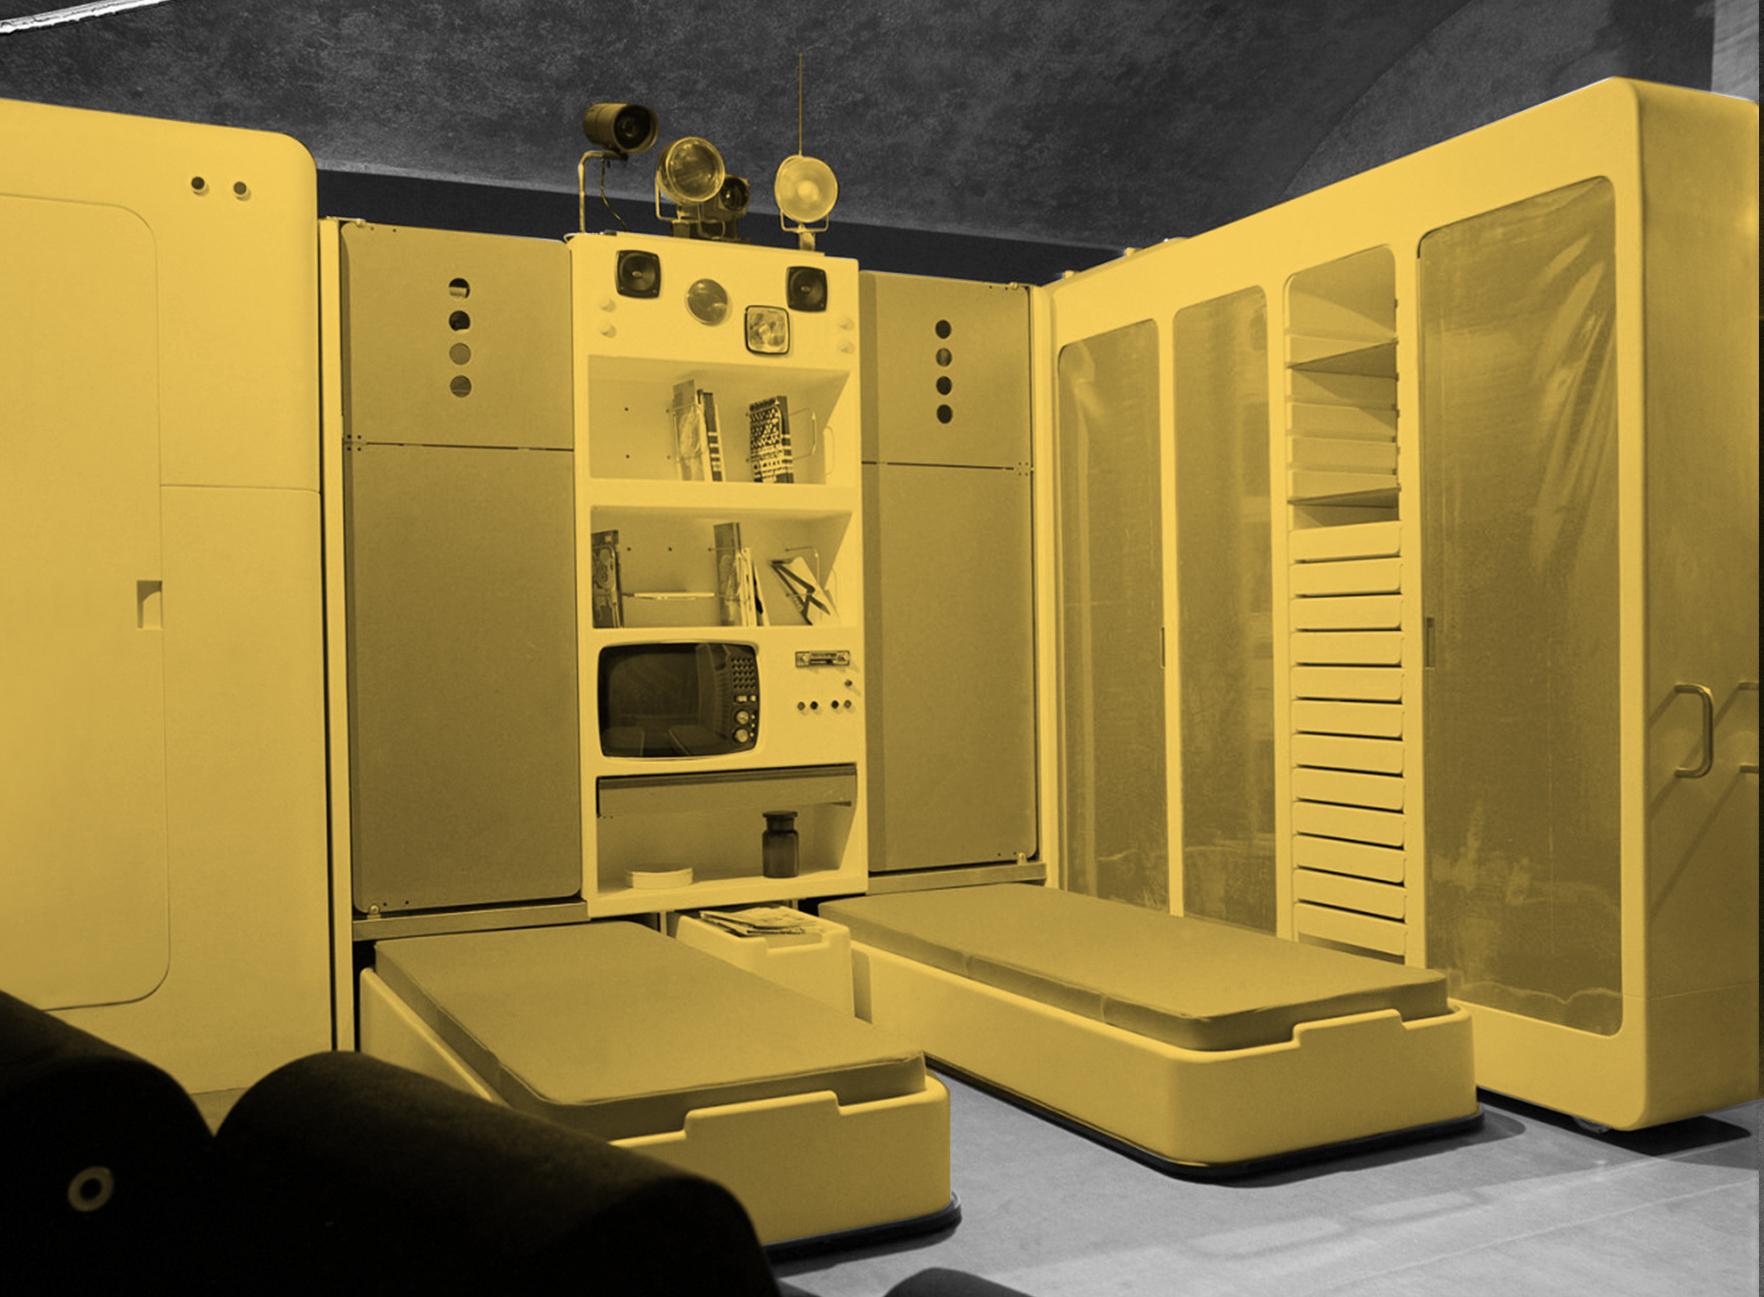 joe-colombo-total-furnishing-unit-moma